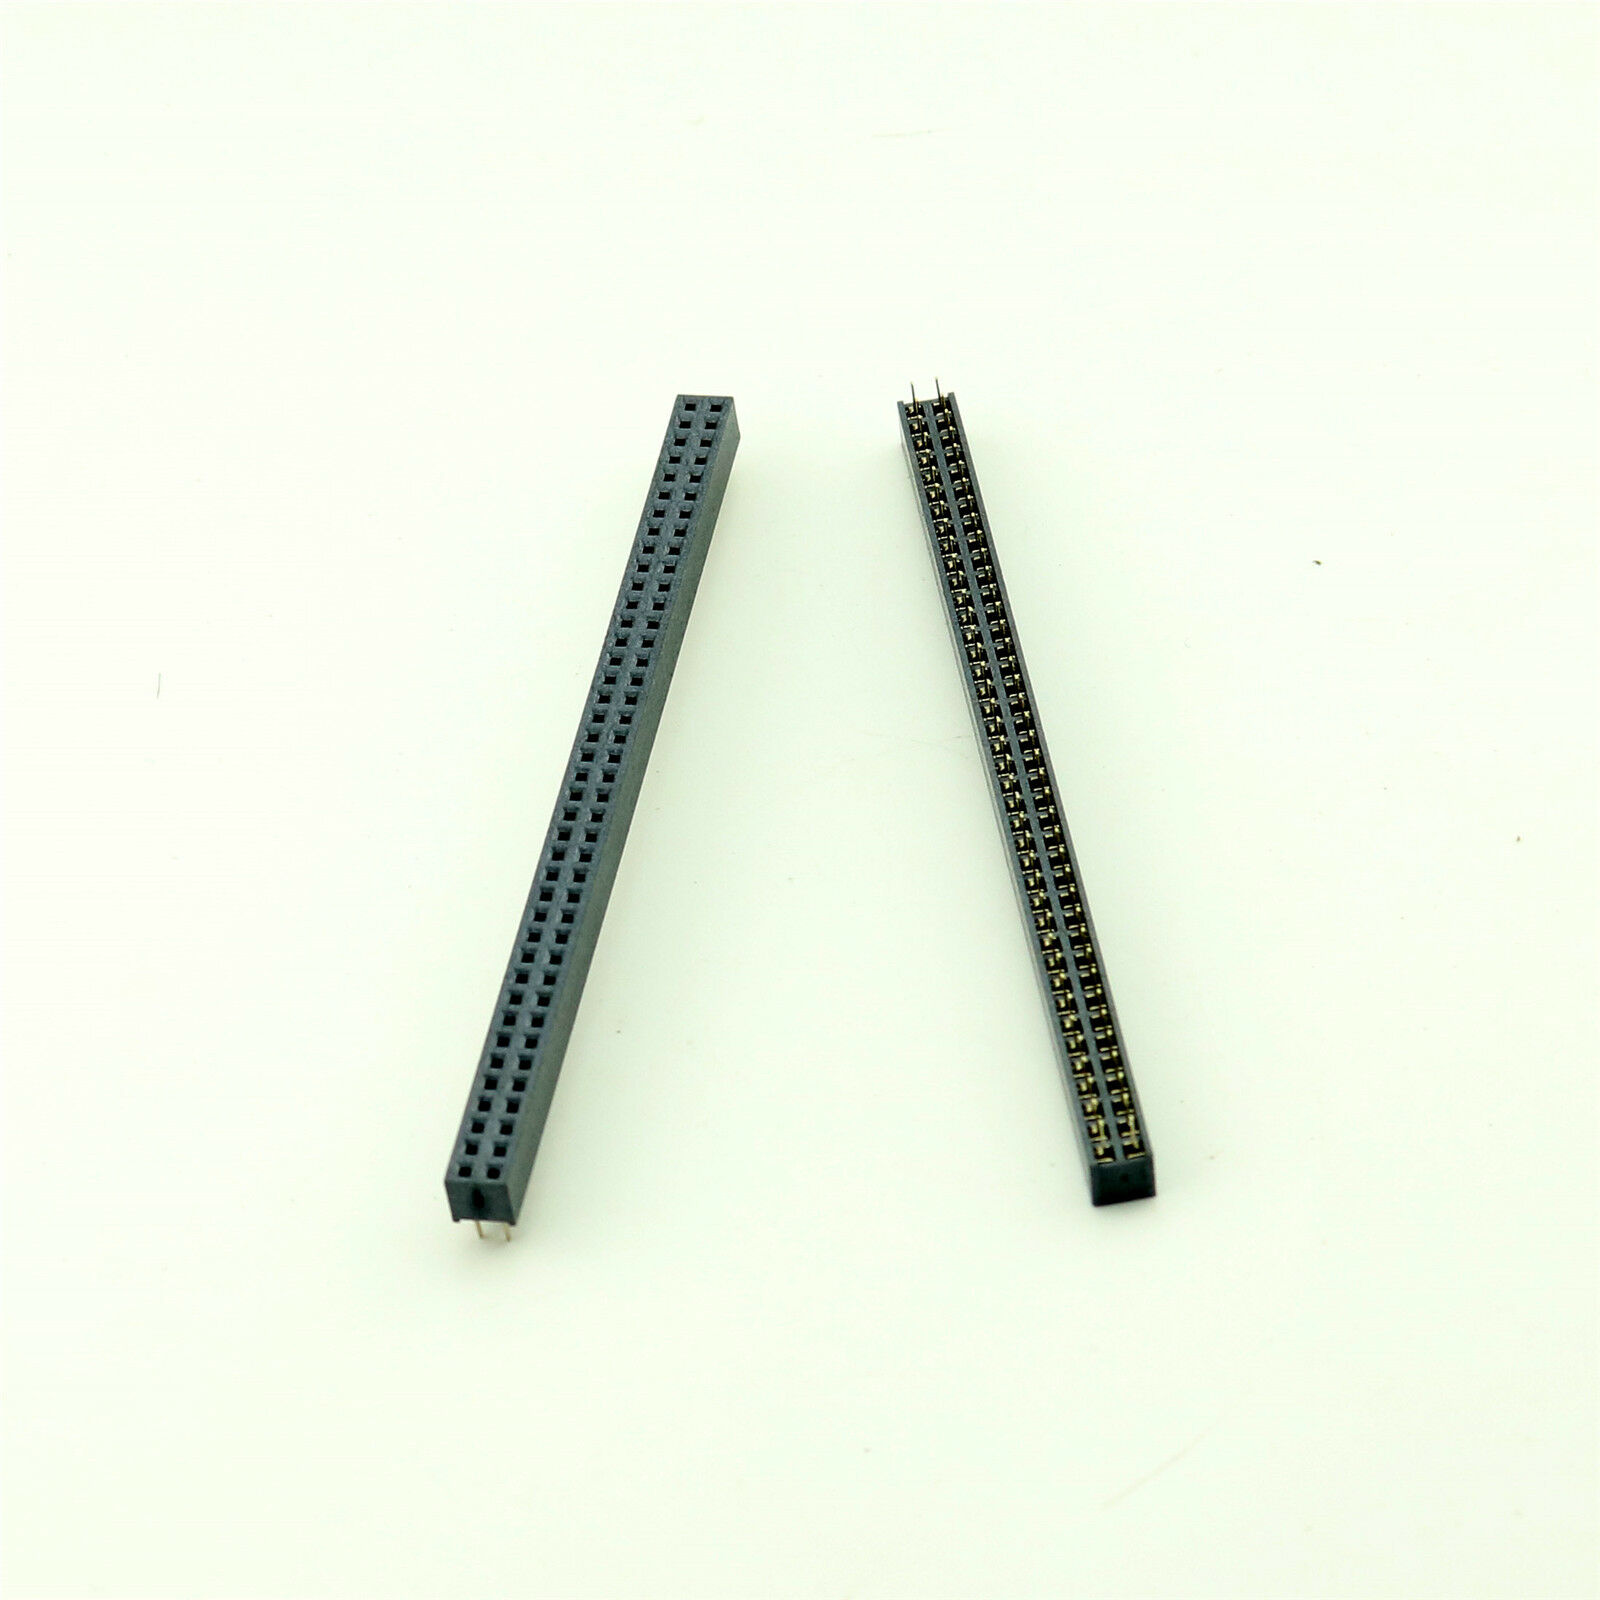 Pin Strip 1,27mm Pin 30 THT Male pin Straight 2x15 DS1031-06-2*15P8BV-4